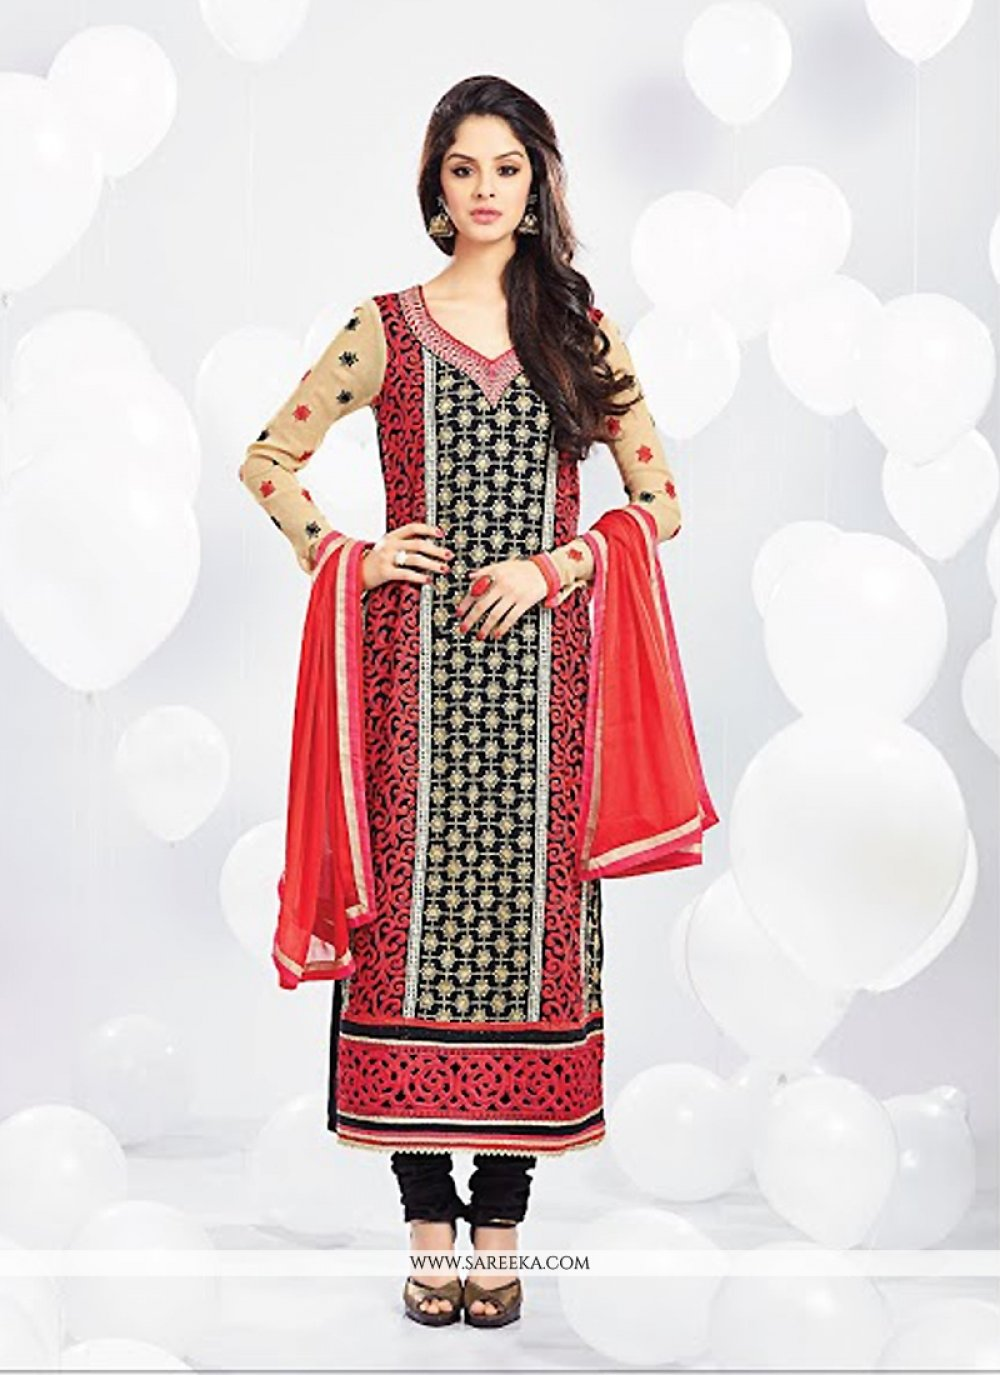 Jaaz Black Resham Work Churidar Suit